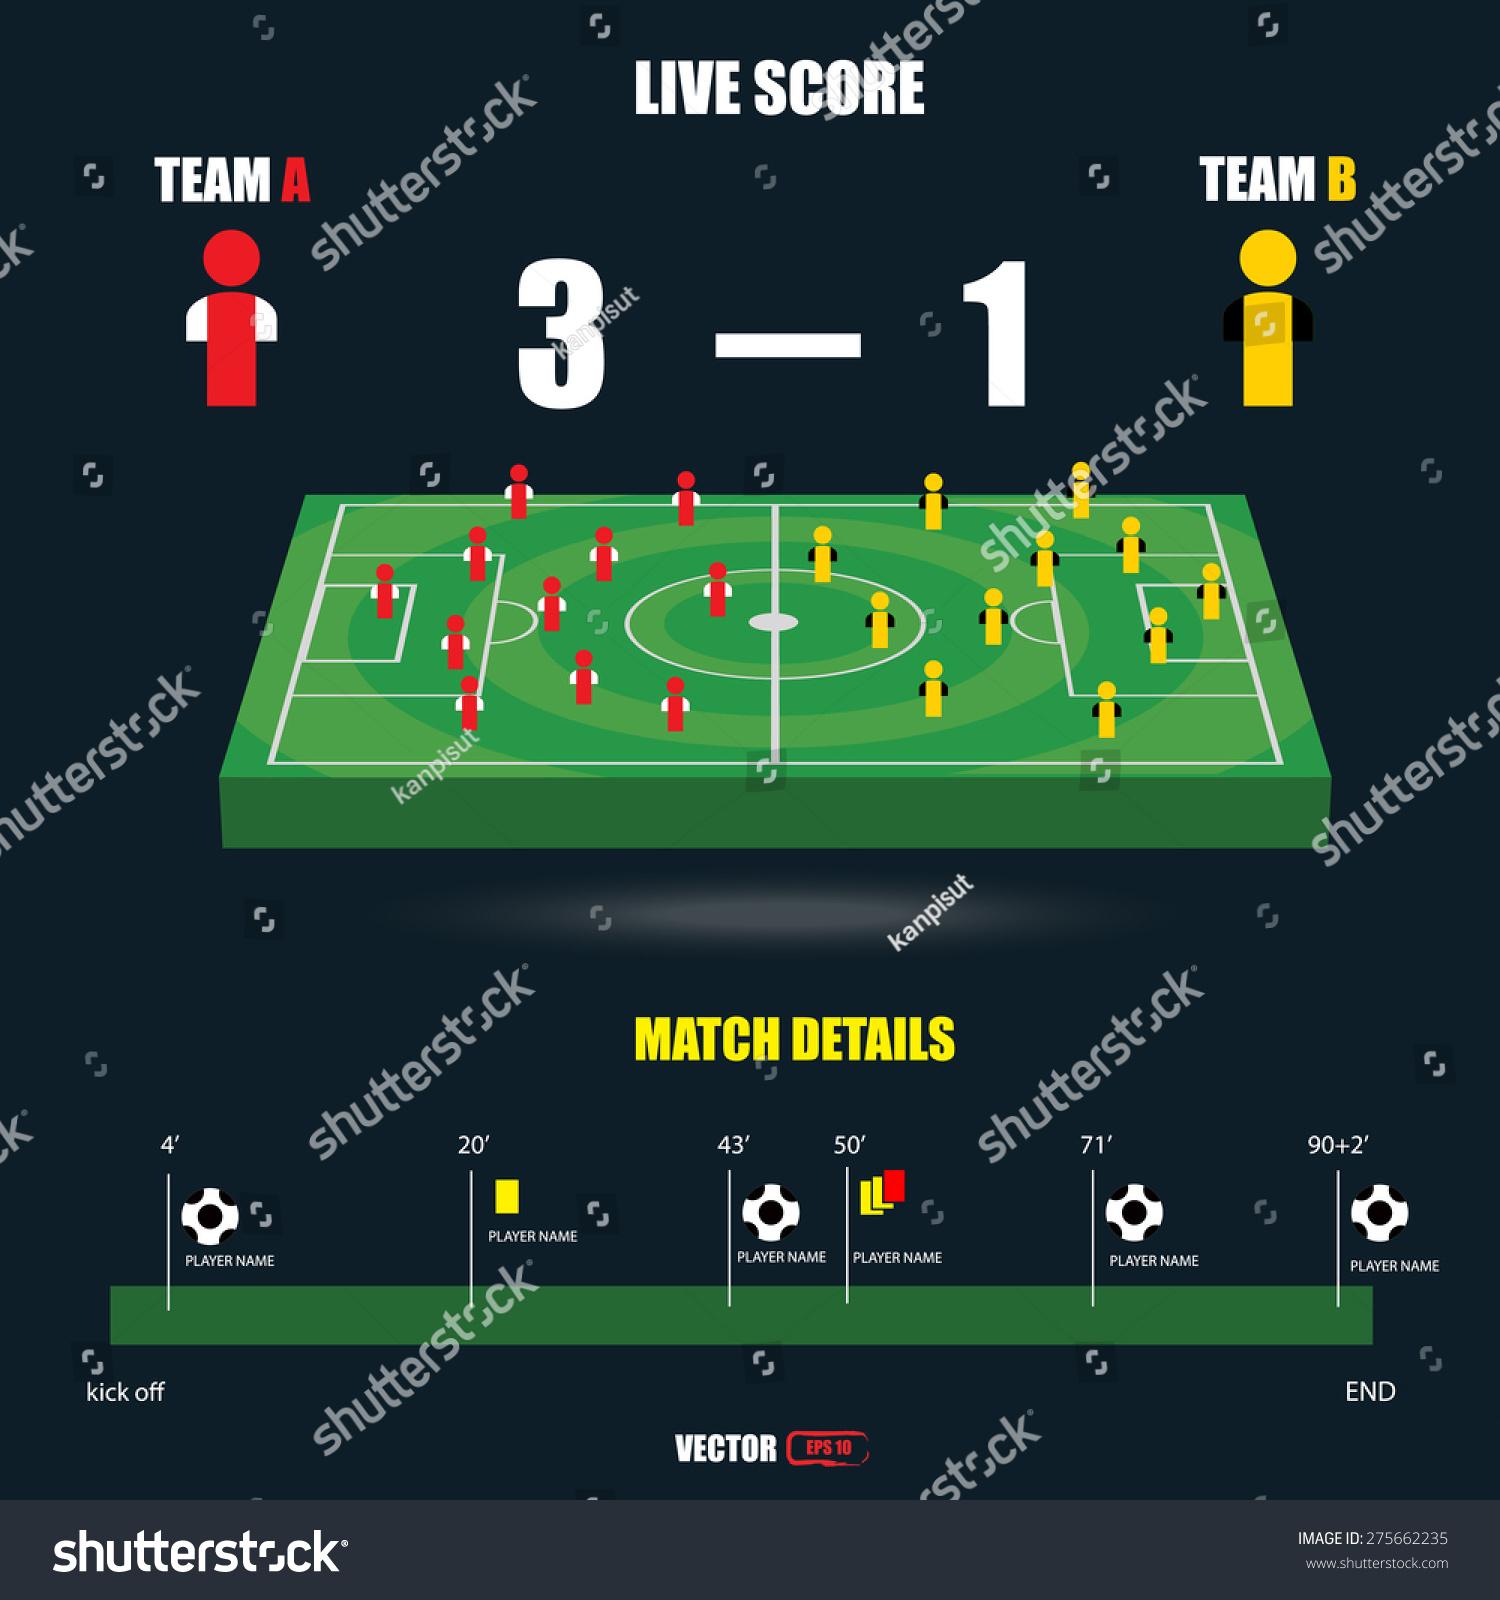 football live score match